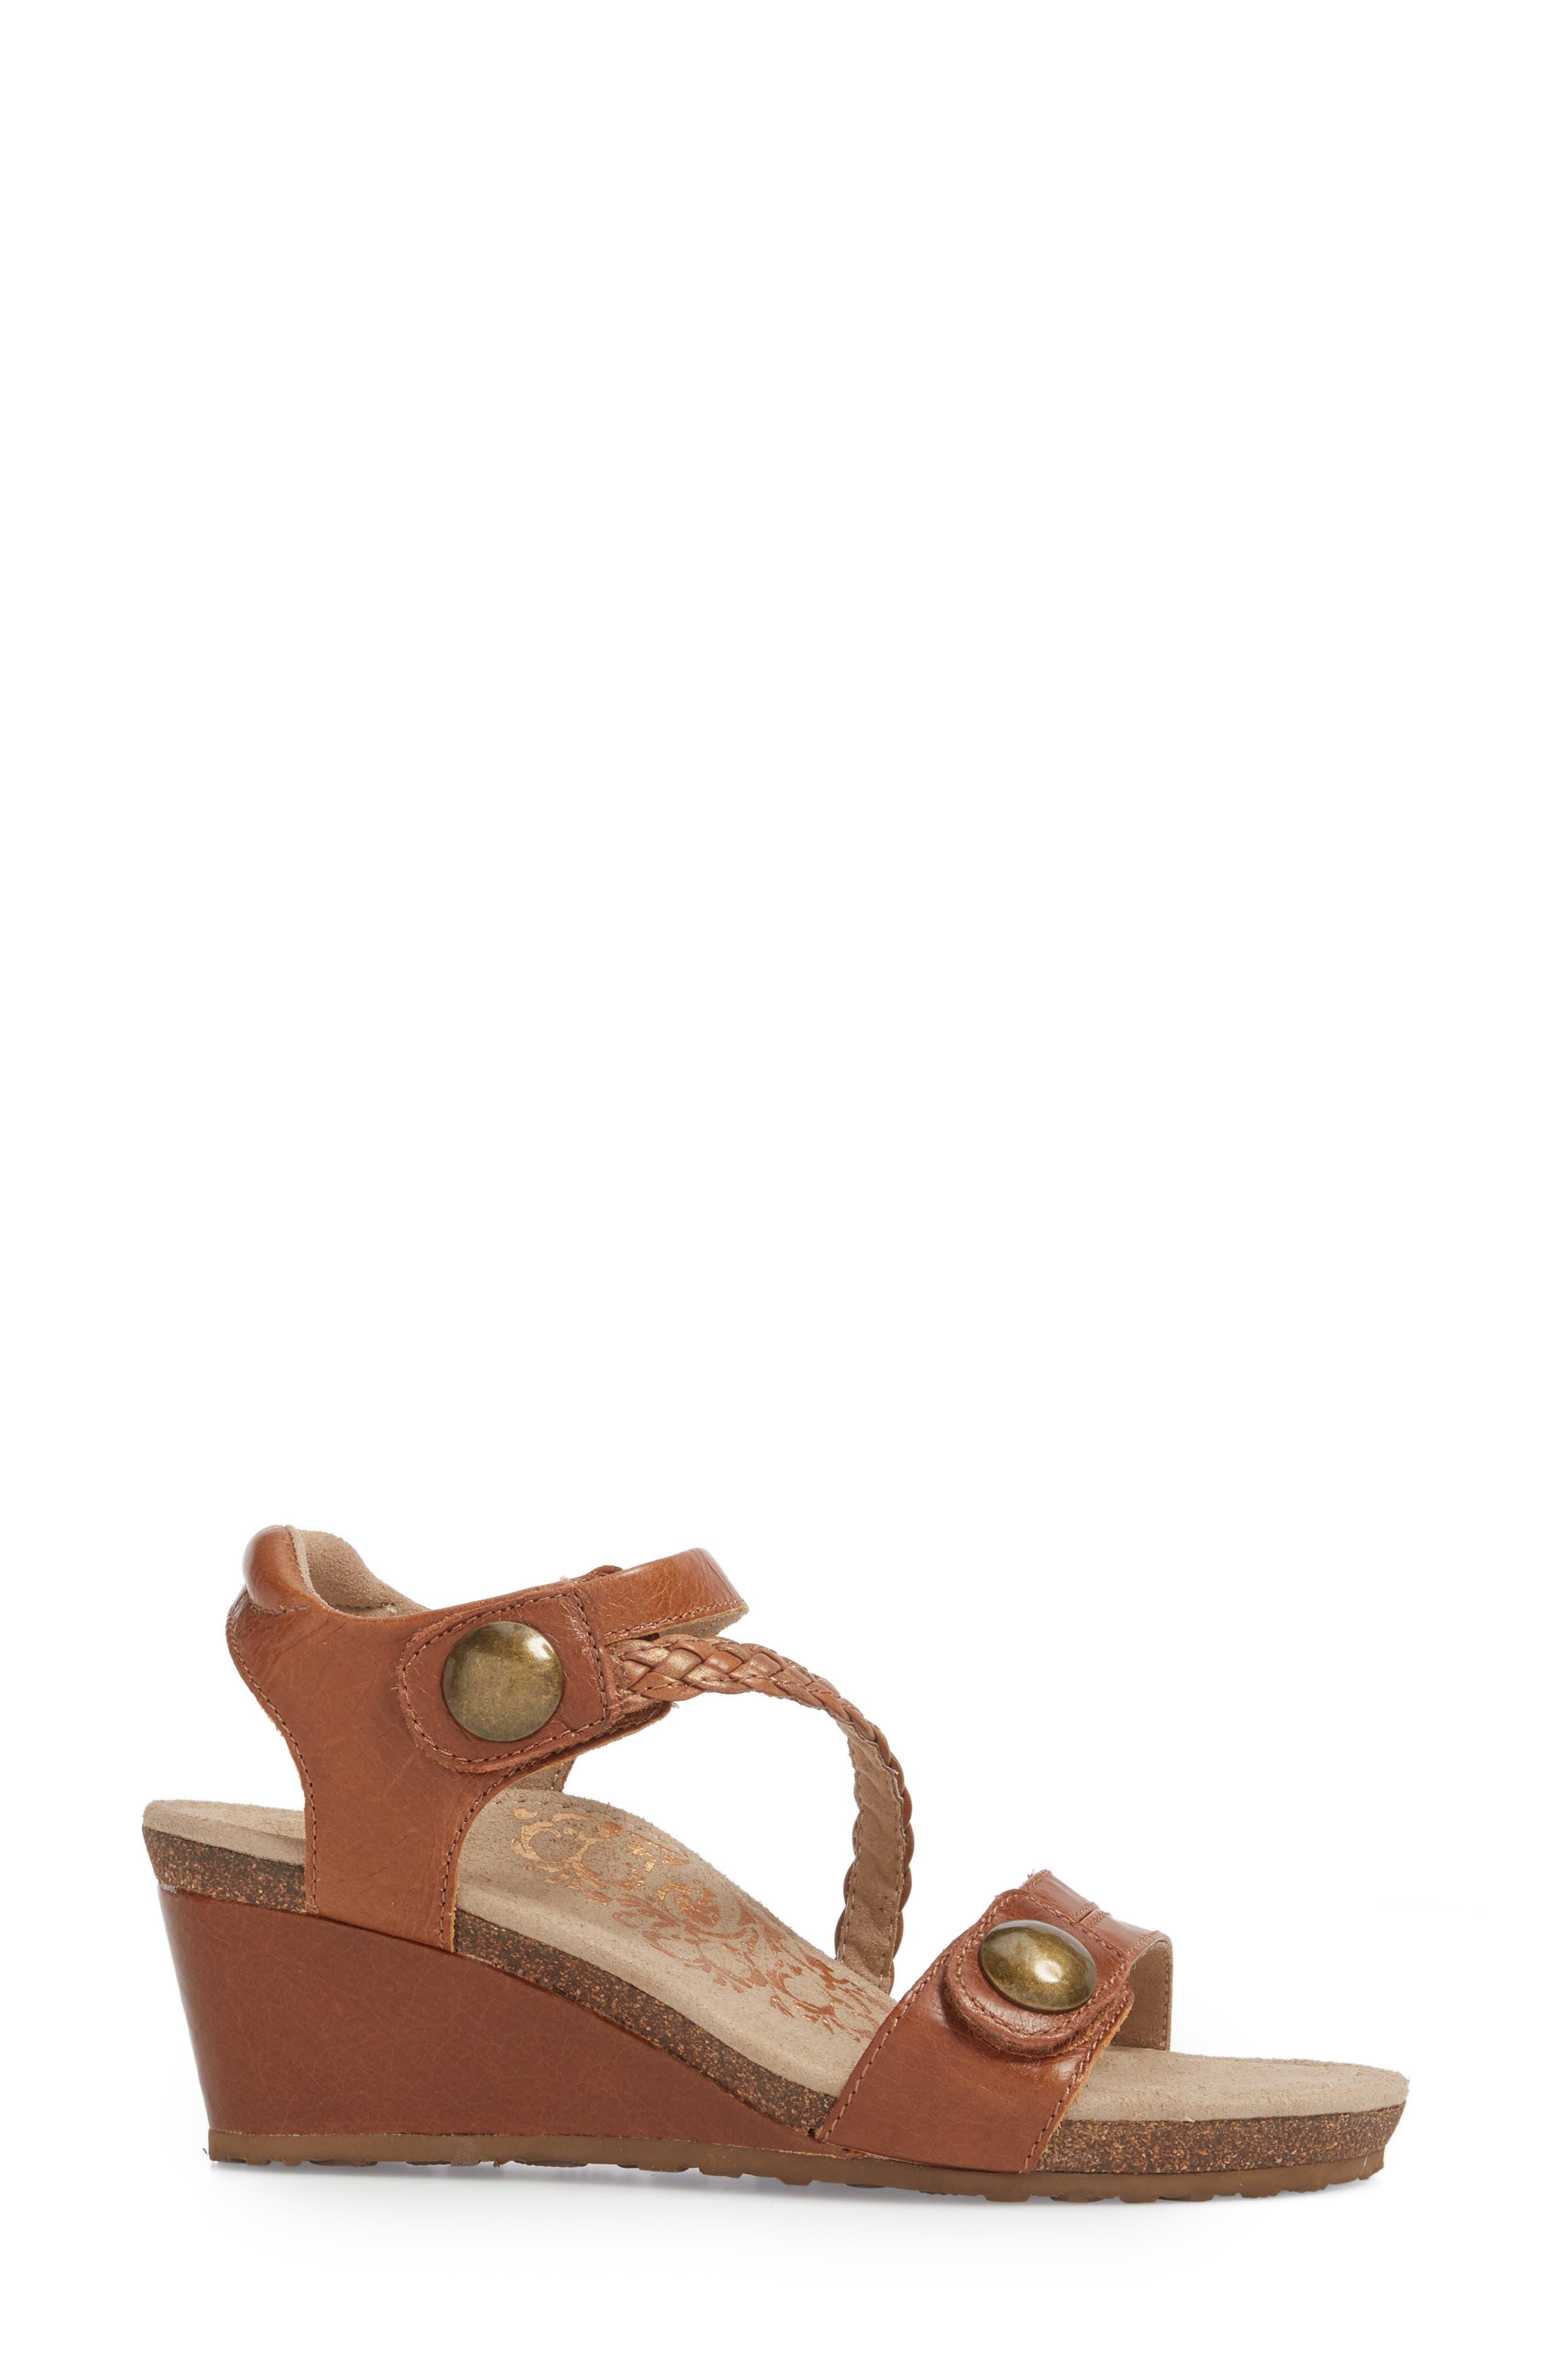 'Naya' Wedge Sandal,                             Alternate thumbnail 3, color,                             Cognac Leather